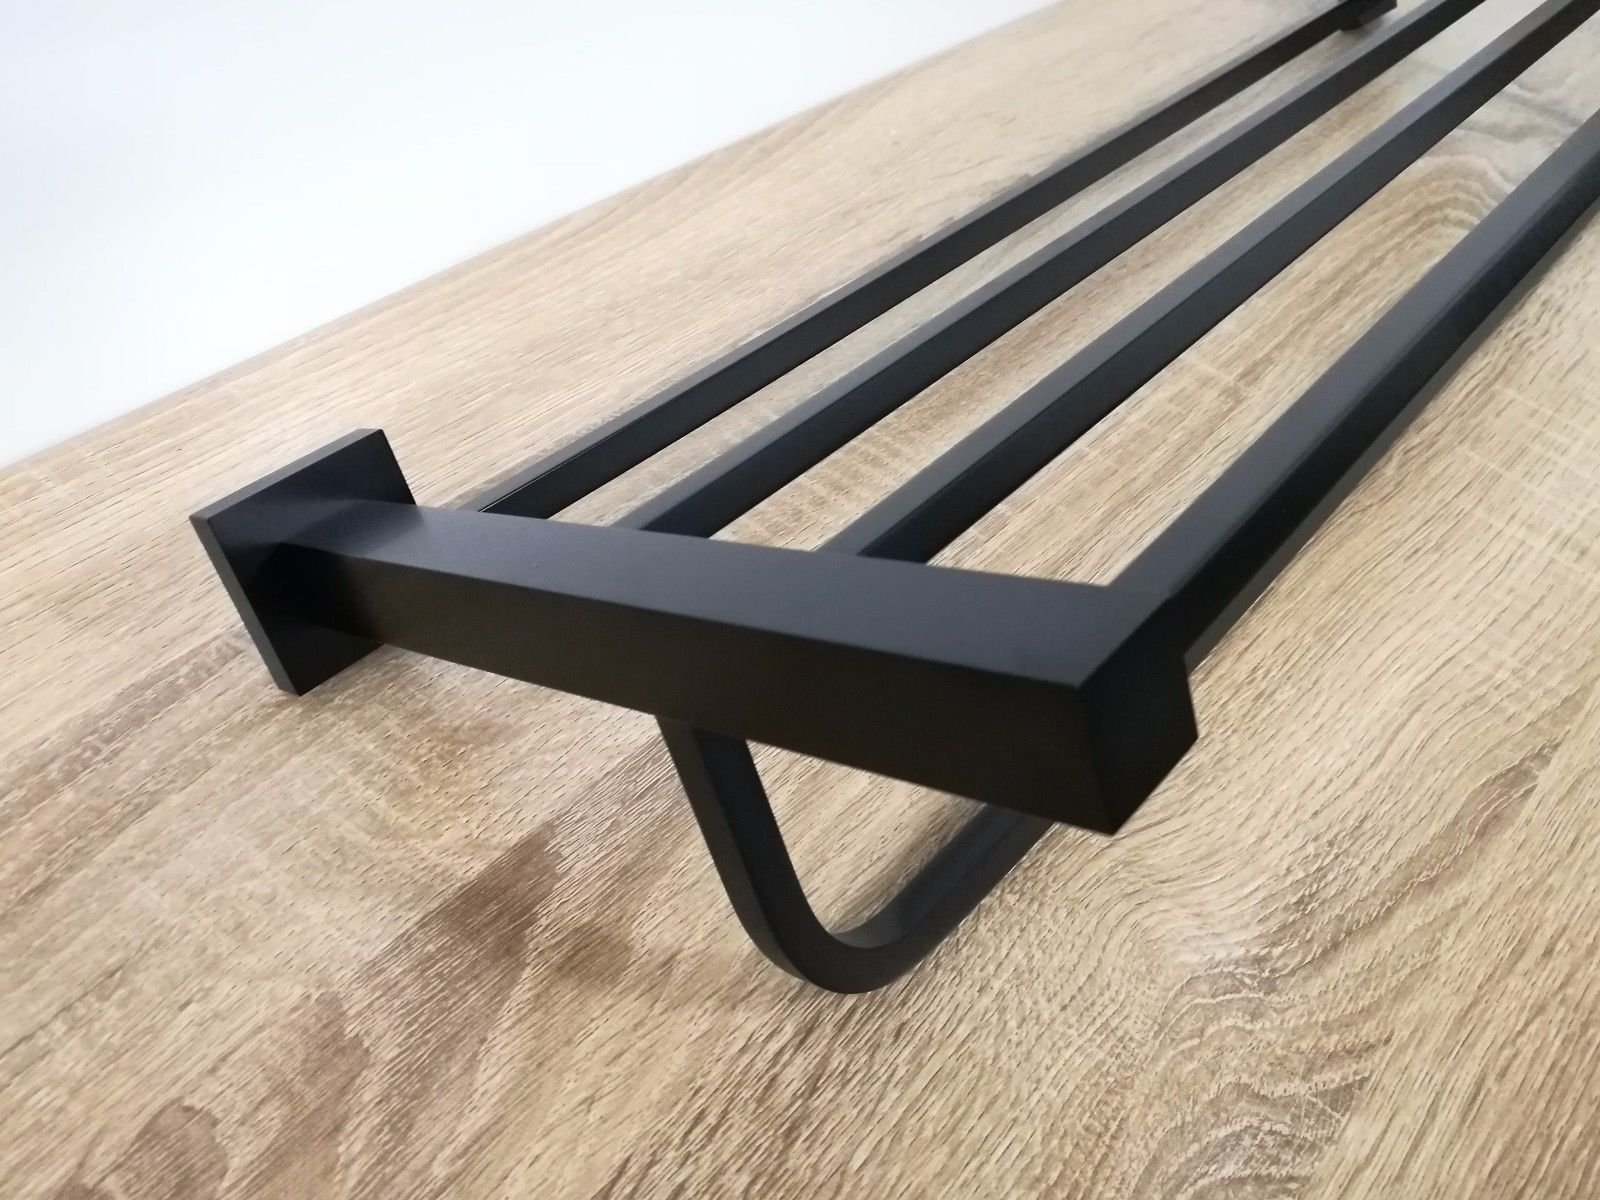 Luxe Square Matte Black 2 In 1 Towel Rack Amp Shelf